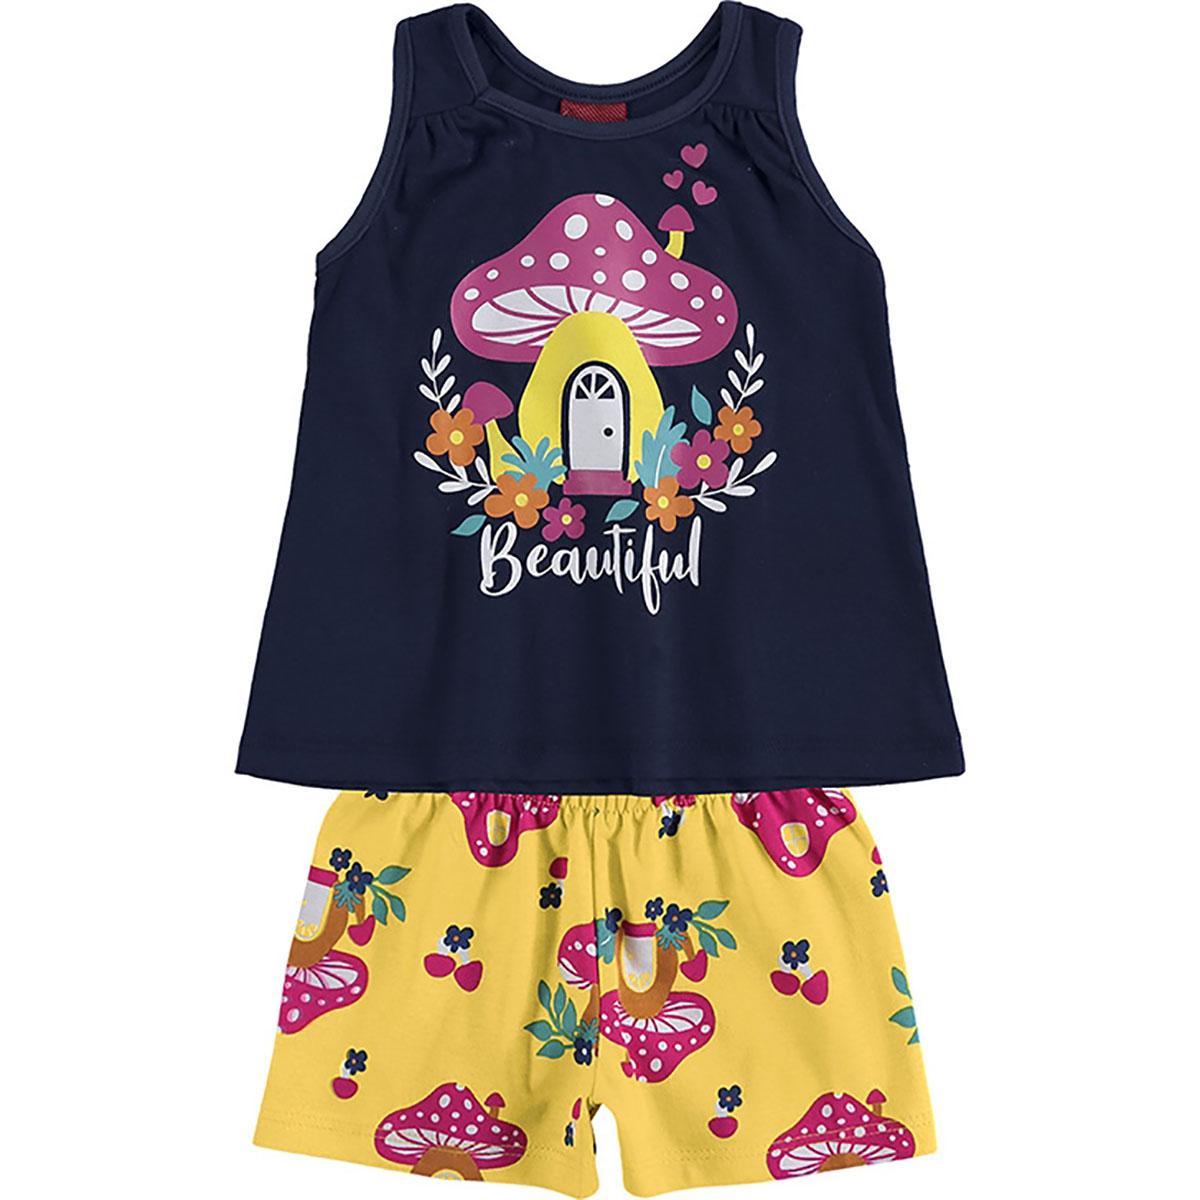 Kit de Conjuntos Bebe Kyly Meninas Verão